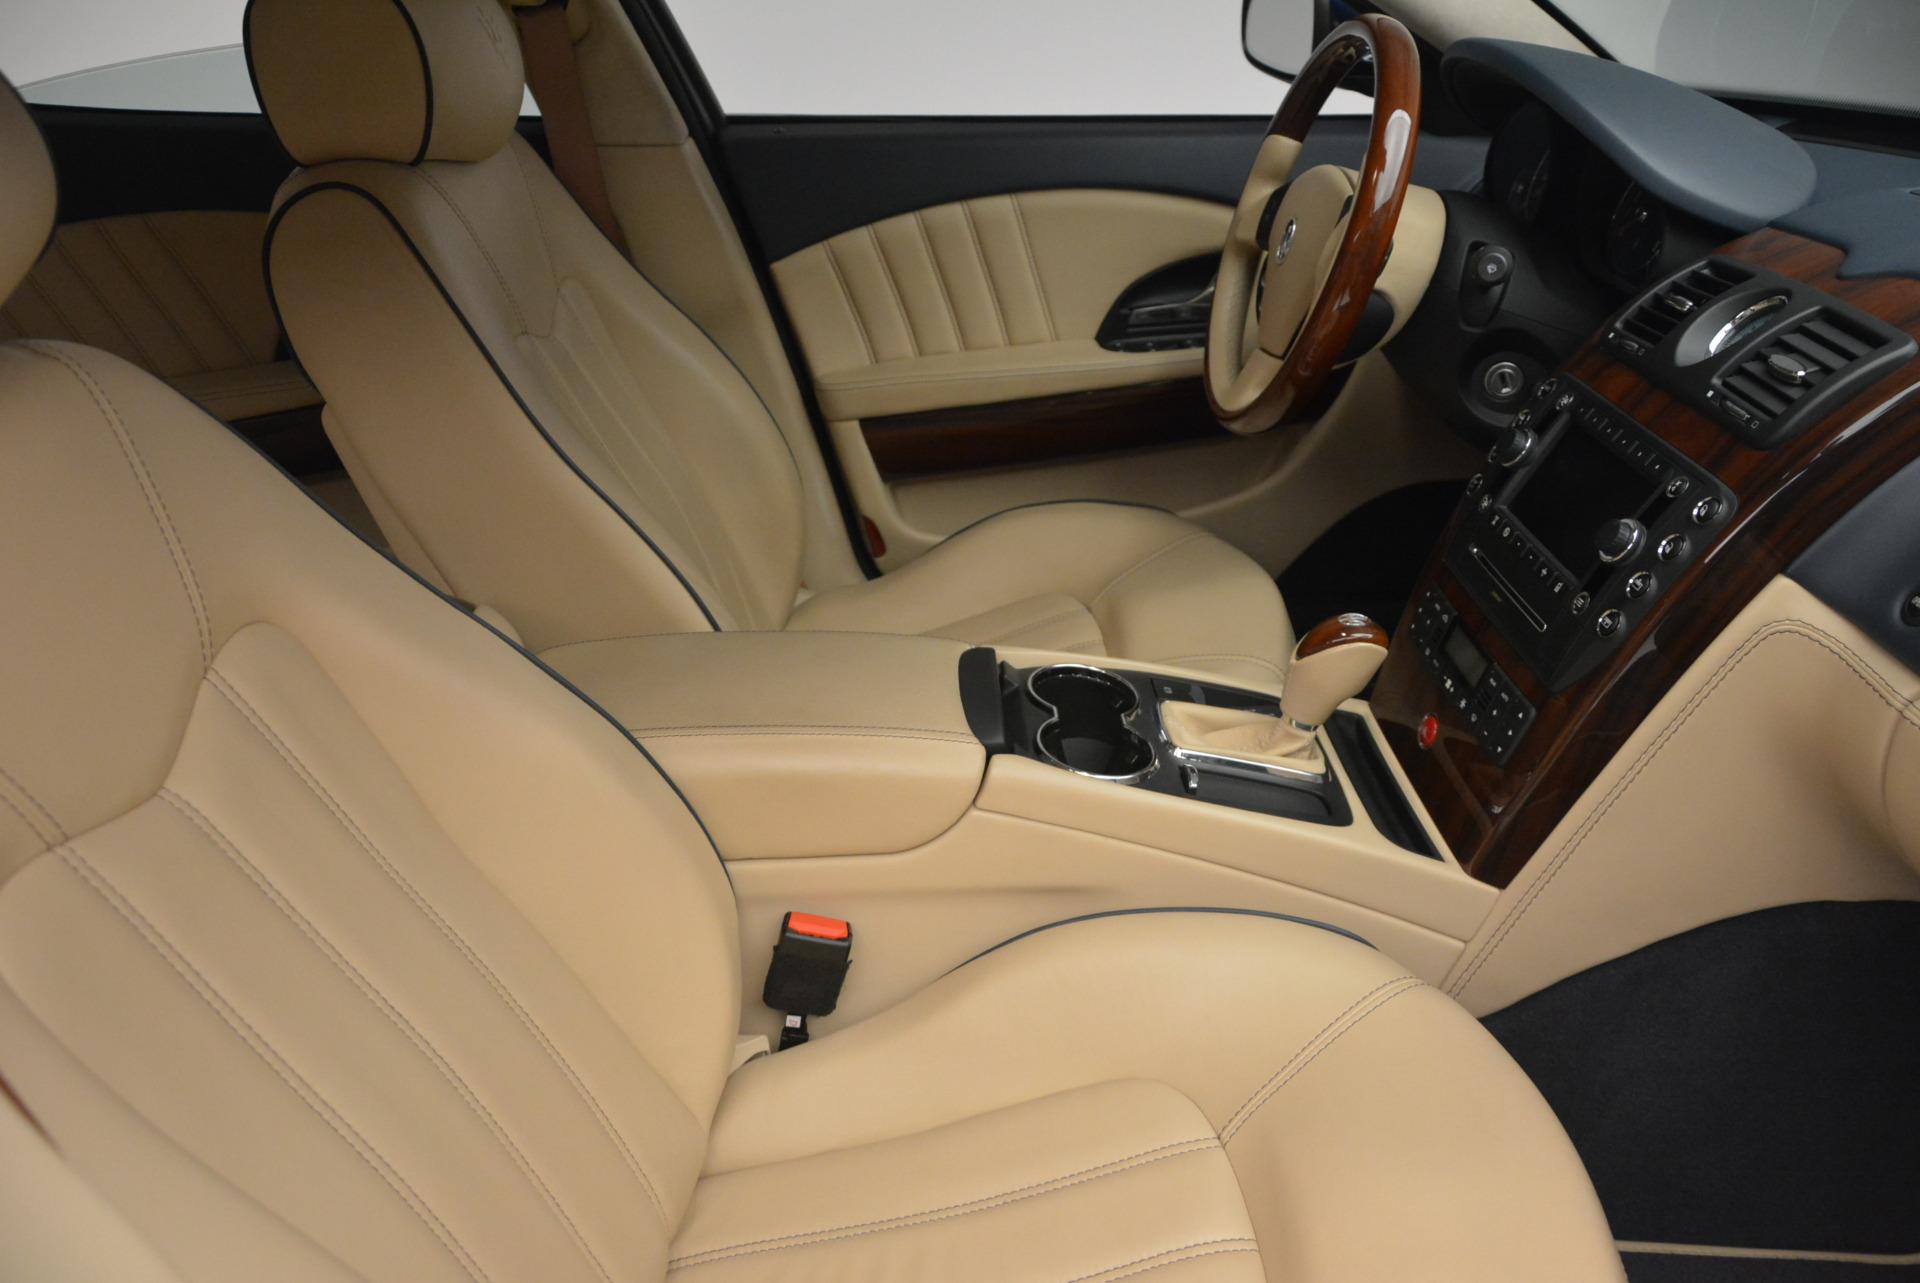 Used 2010 Maserati Quattroporte S For Sale In Westport, CT 795_p18